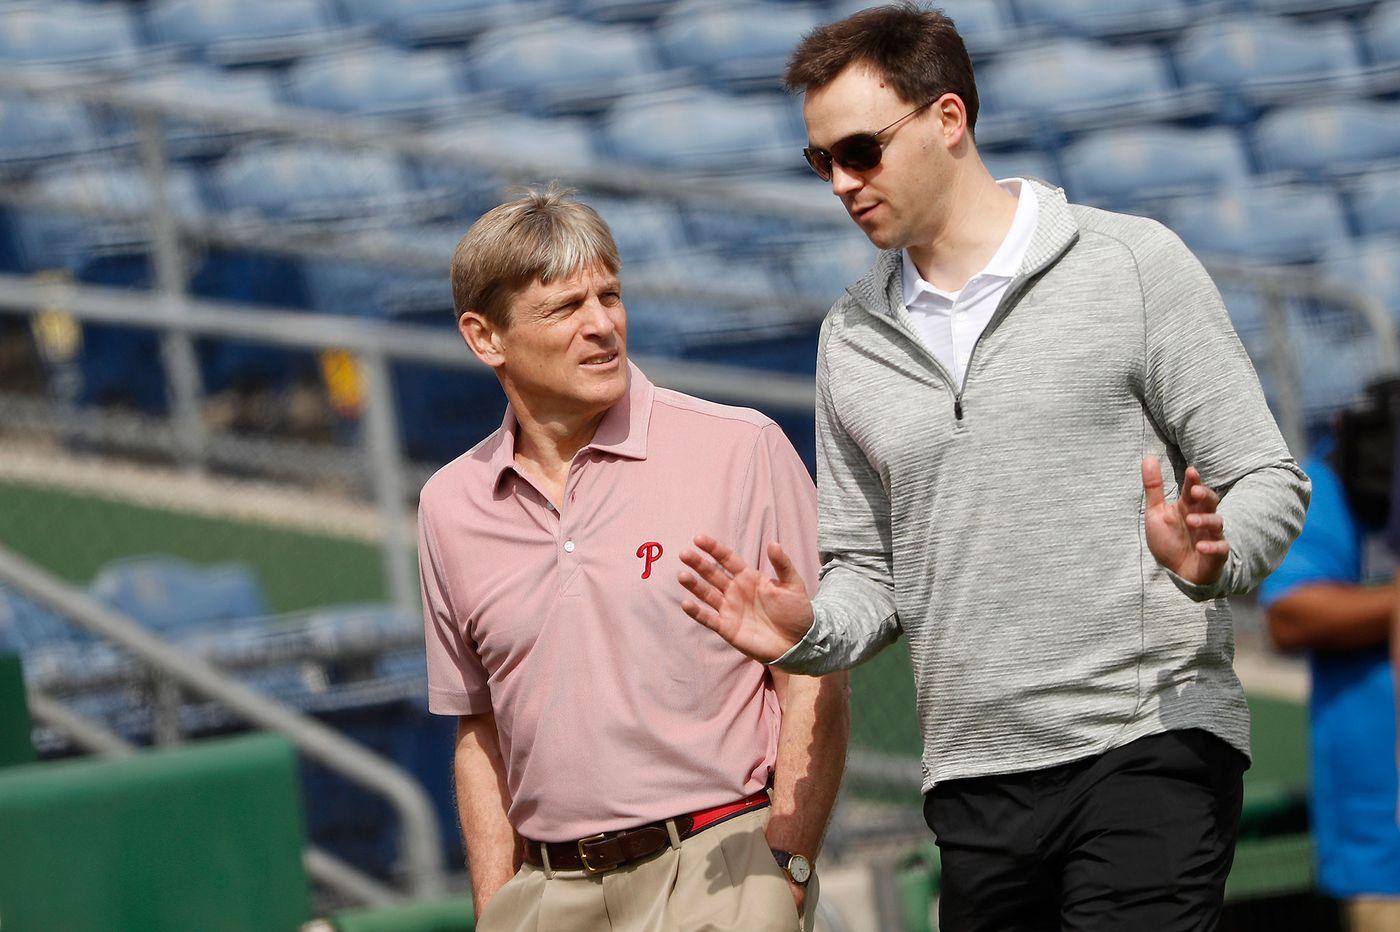 In terrific addition of Jean Segura, Phillies GM Matt Klentak makes key subtractions   Bob Brookover